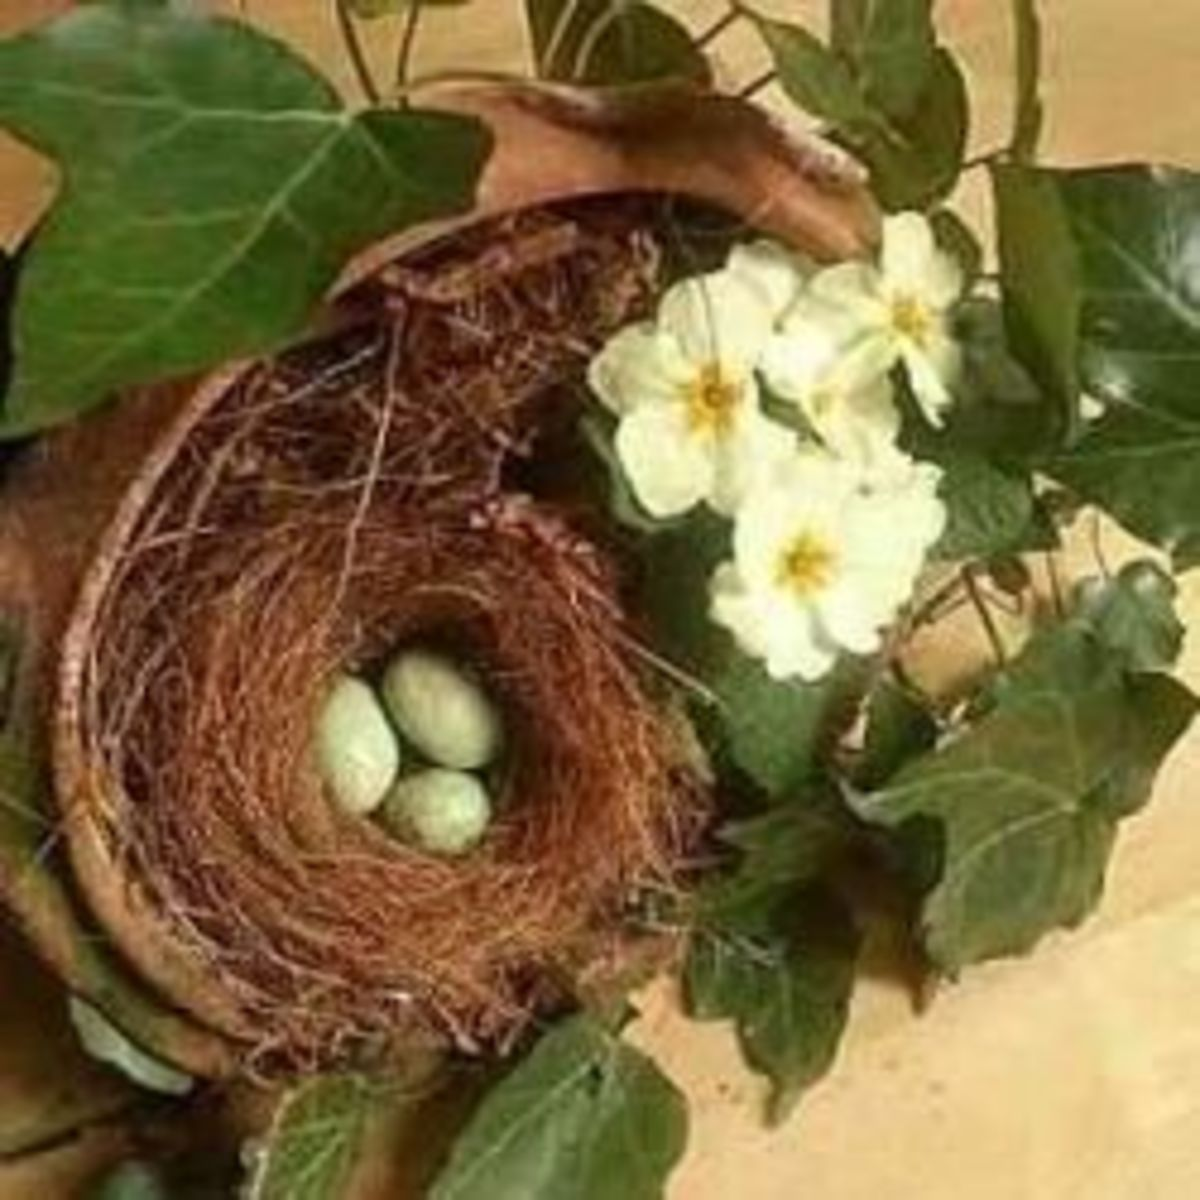 Birds Nests Crafts: Make Birds Nests